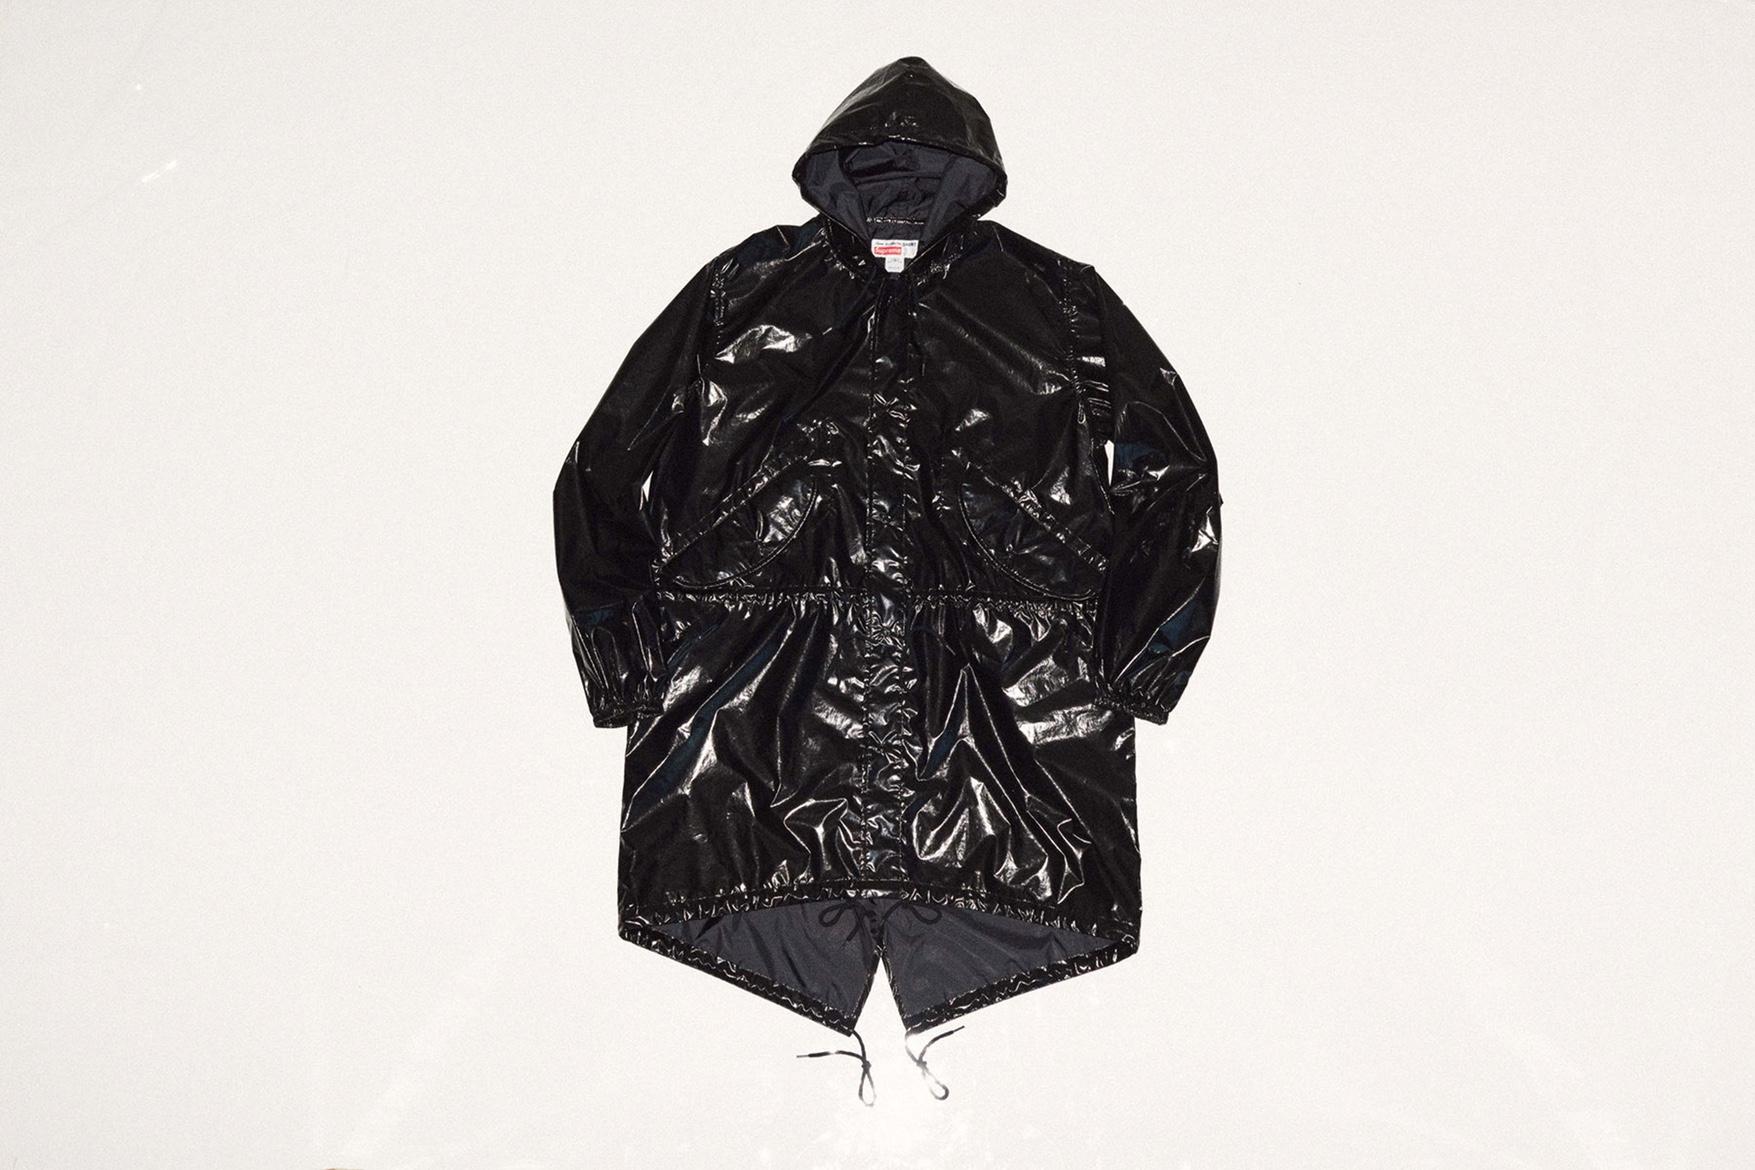 http---hypebeast.com-image-2017-04-supreme-comme-des-garcons-shirt-2017-spring-summer-collection-black-fishtail-parka-front-10.jpg